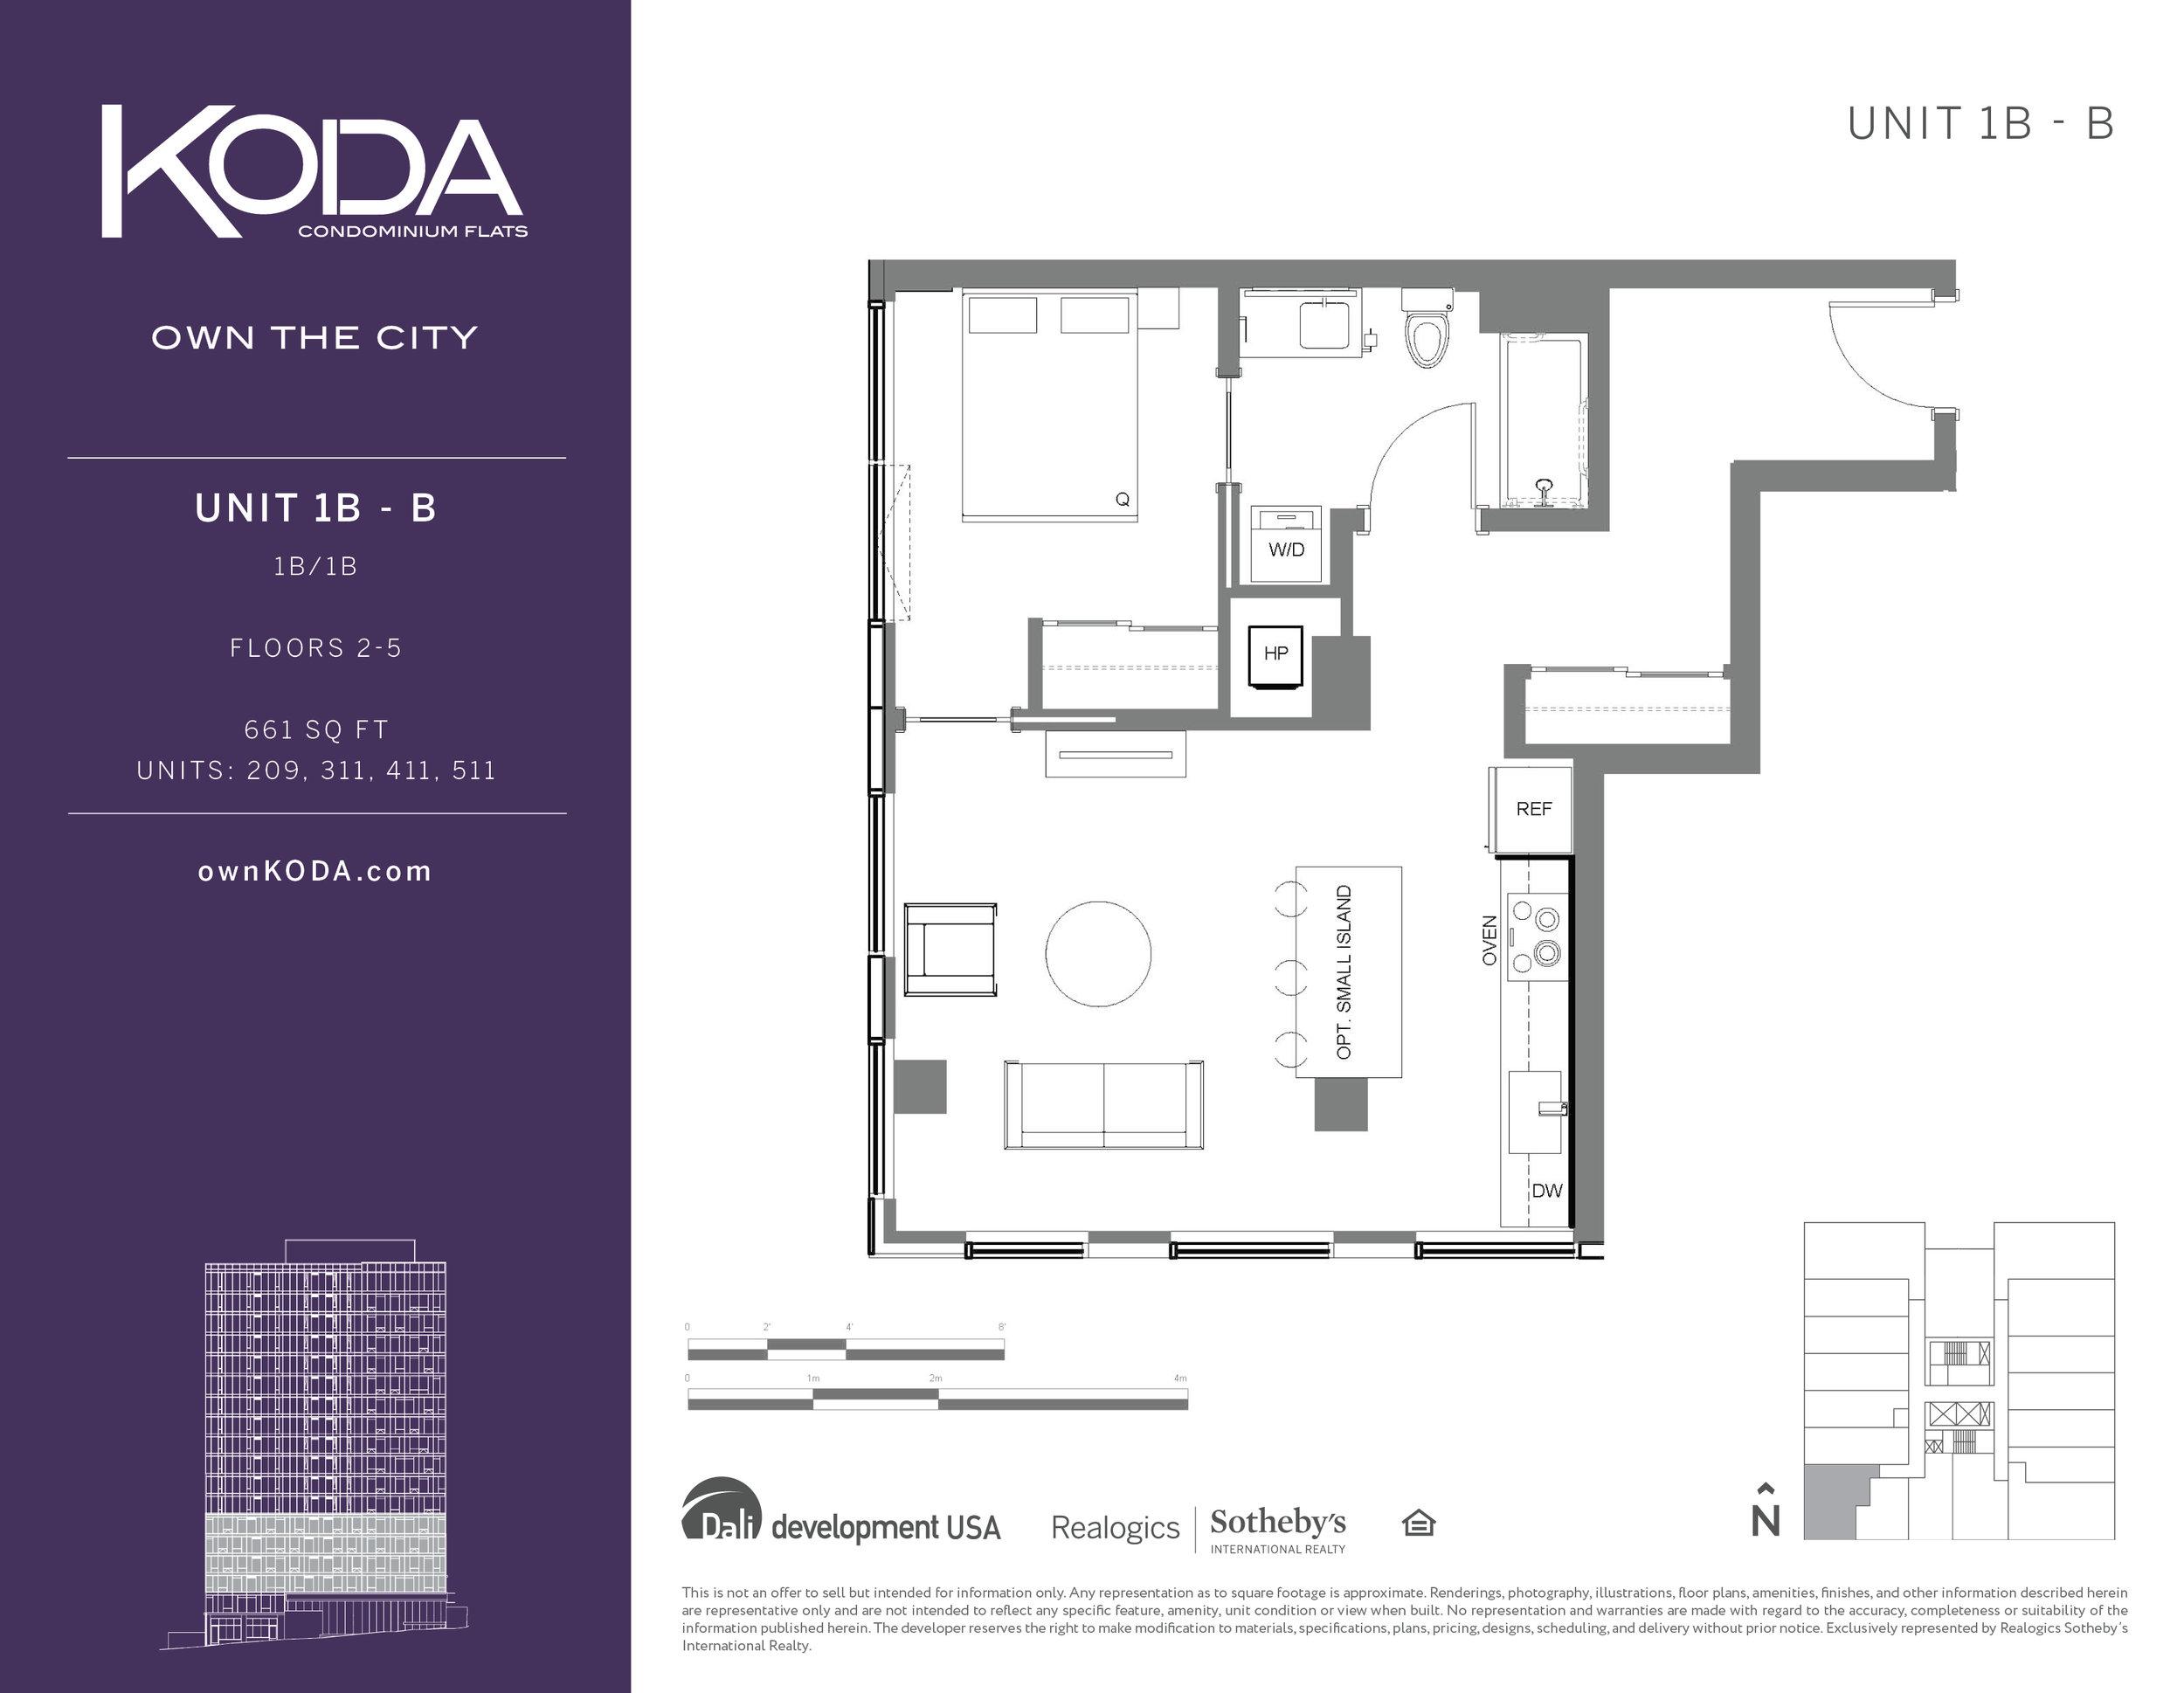 KODA_FloorPlanFlyer_Update_Approved_04.04.19_Release24.jpg